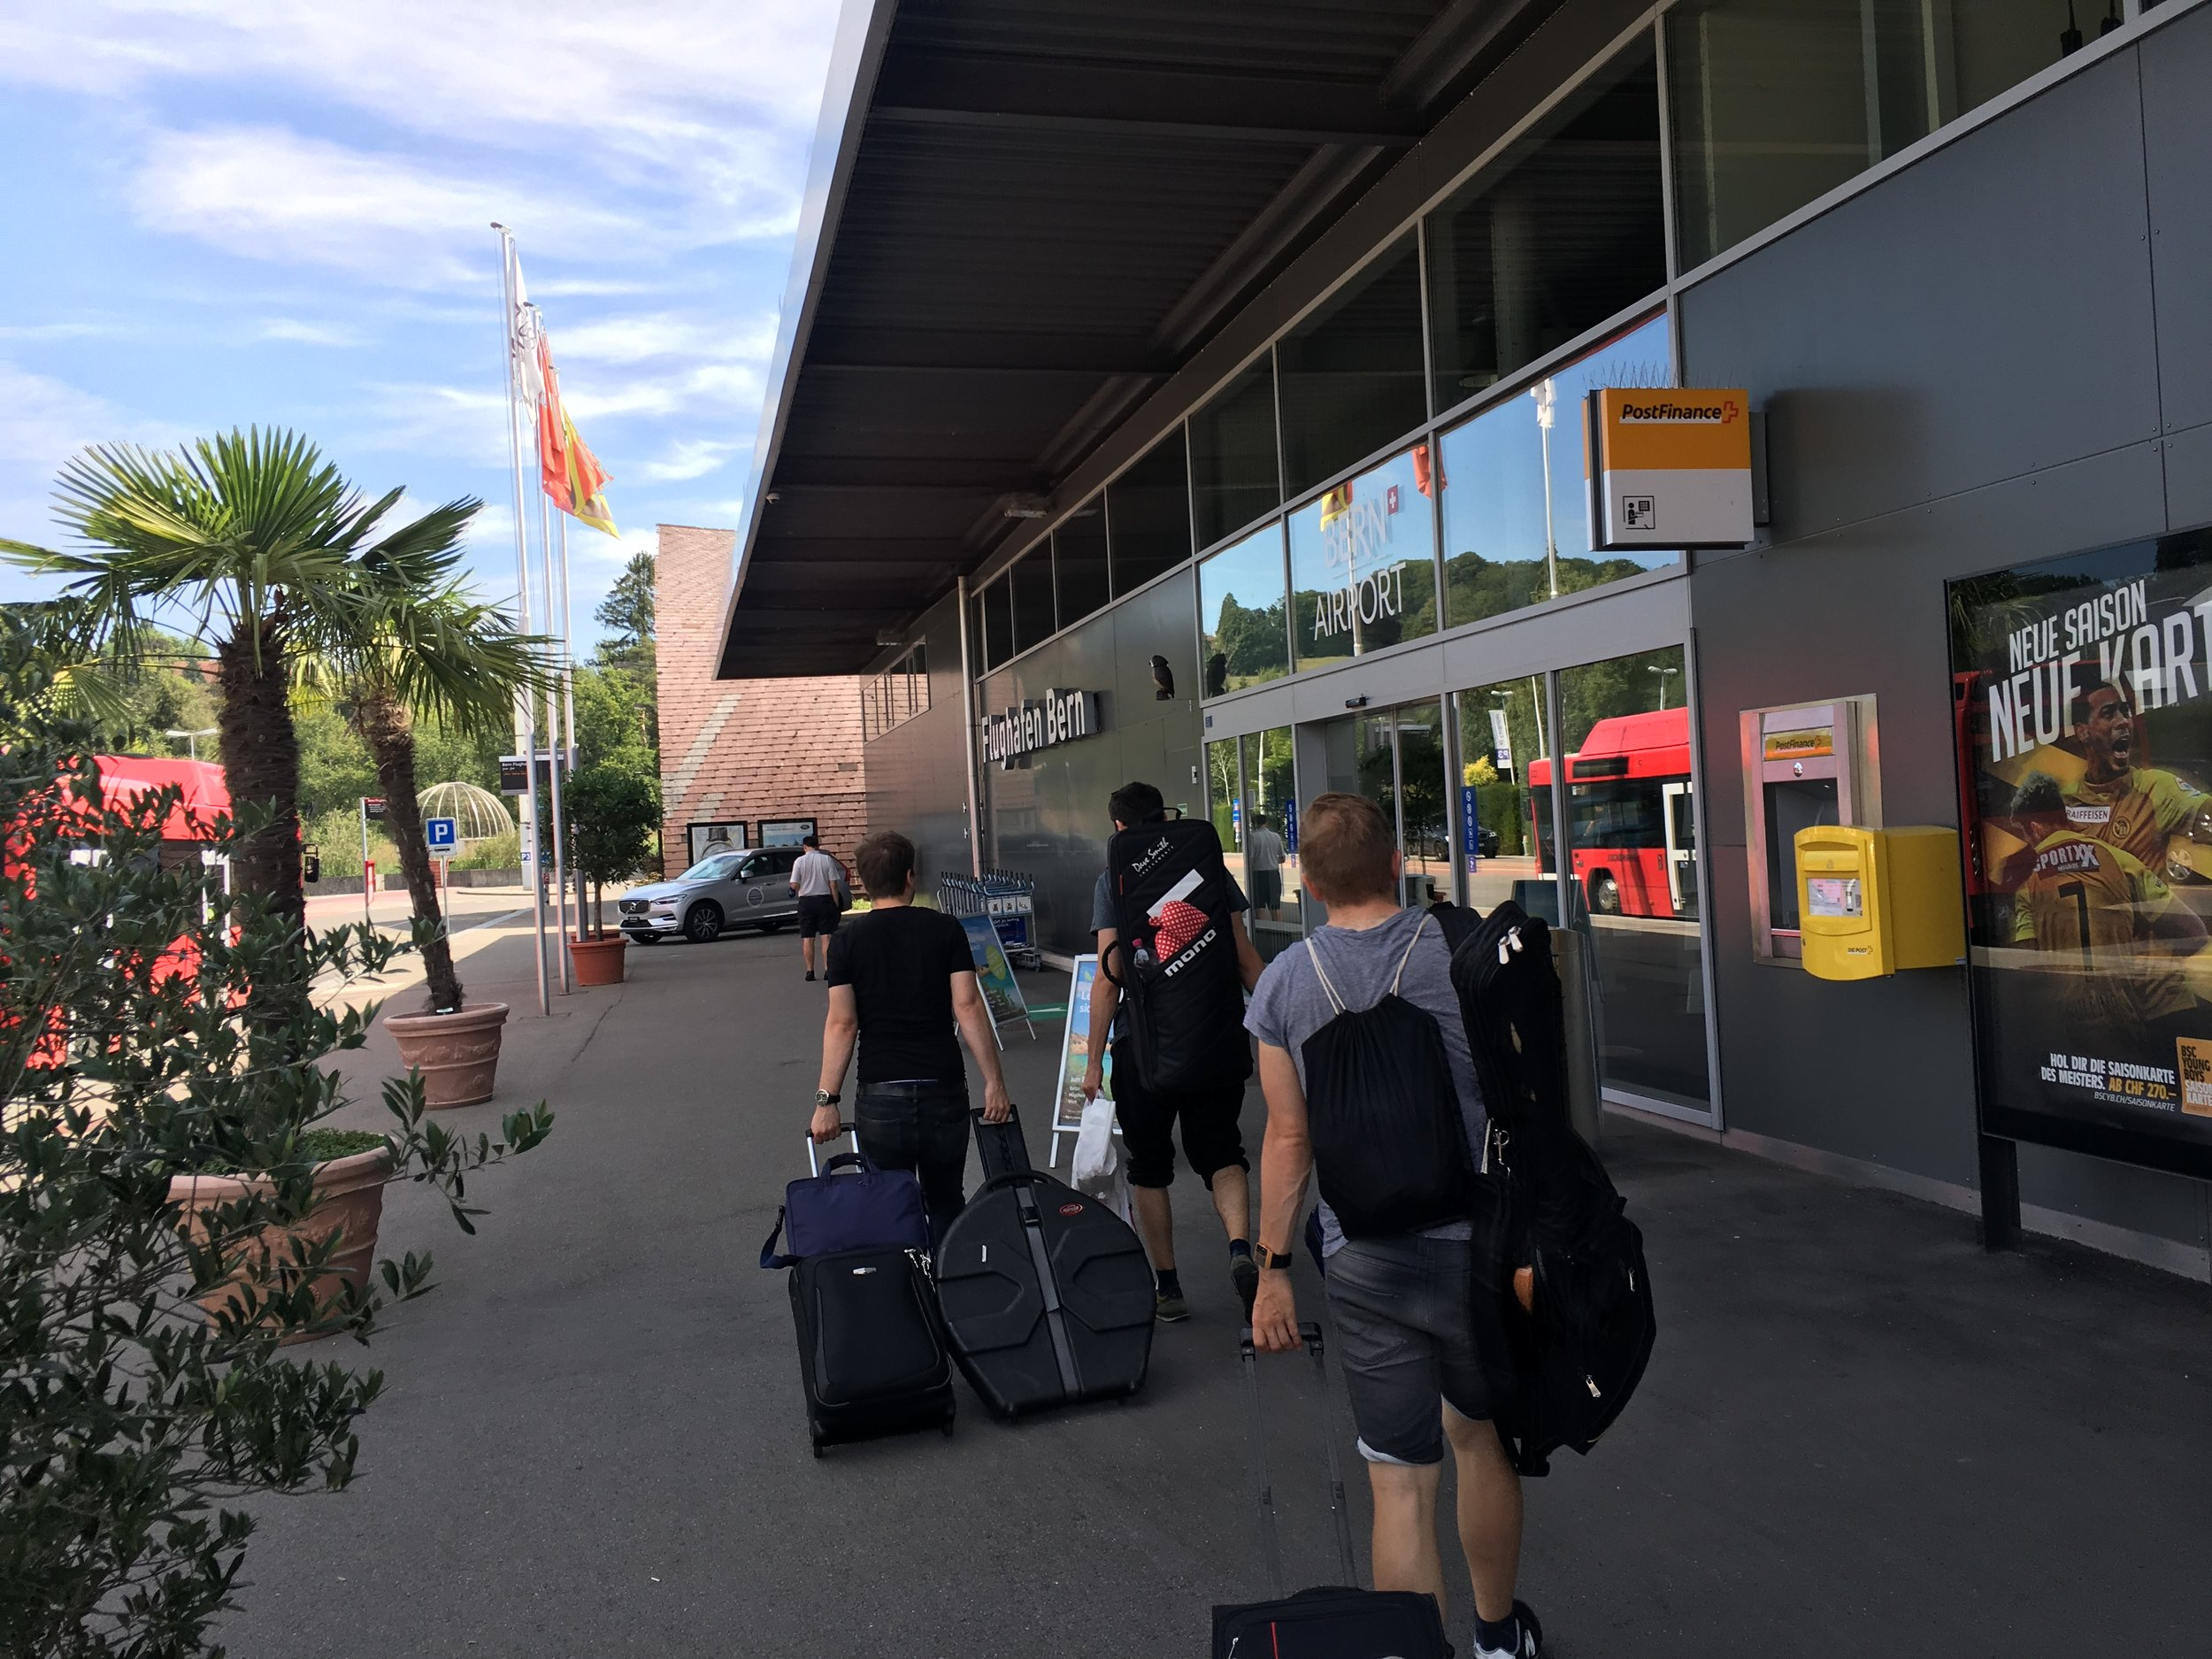 Airport_2_Bern.JPG